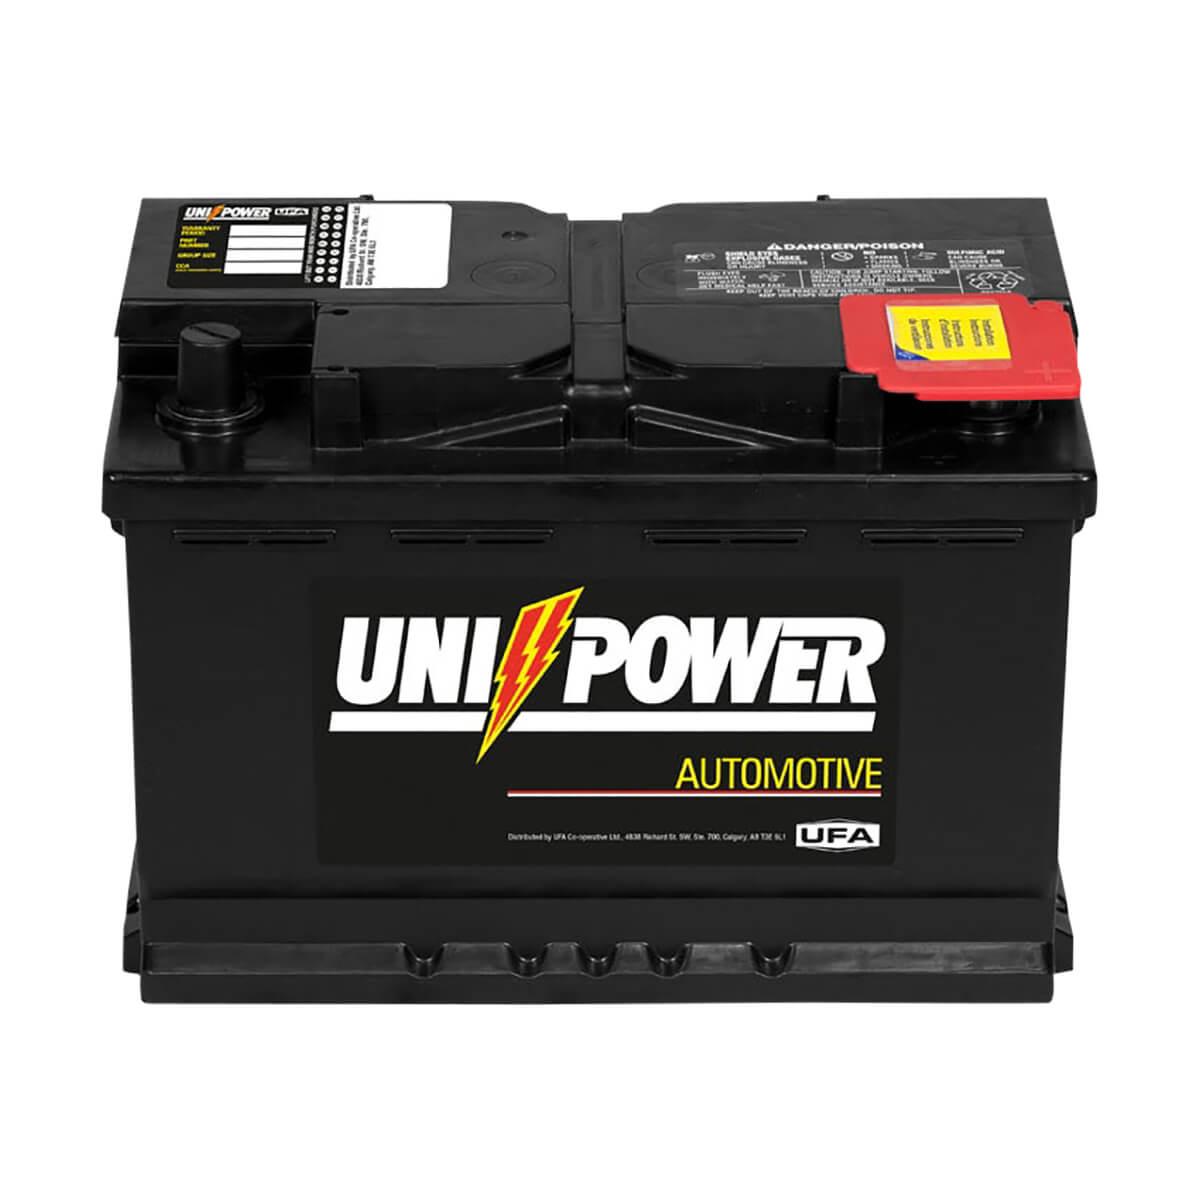 Uni-Power Auto/Truck/SUV Battery - 65-H6